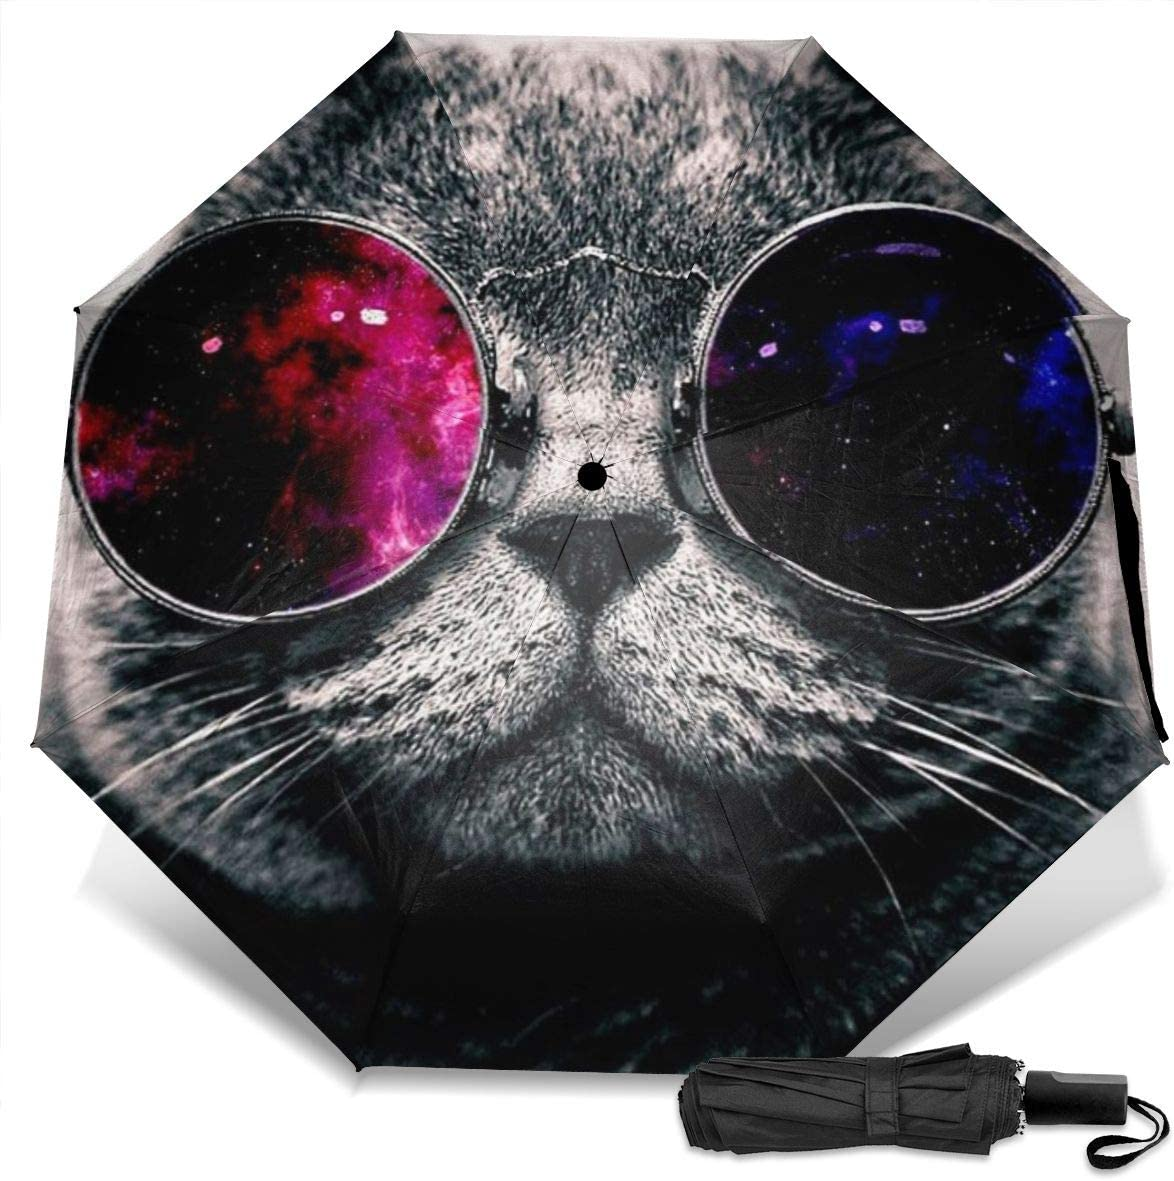 Cat Wear Sunglasses MMLCGG Lightweight Portable Sun/&Rain Travel Umbrella